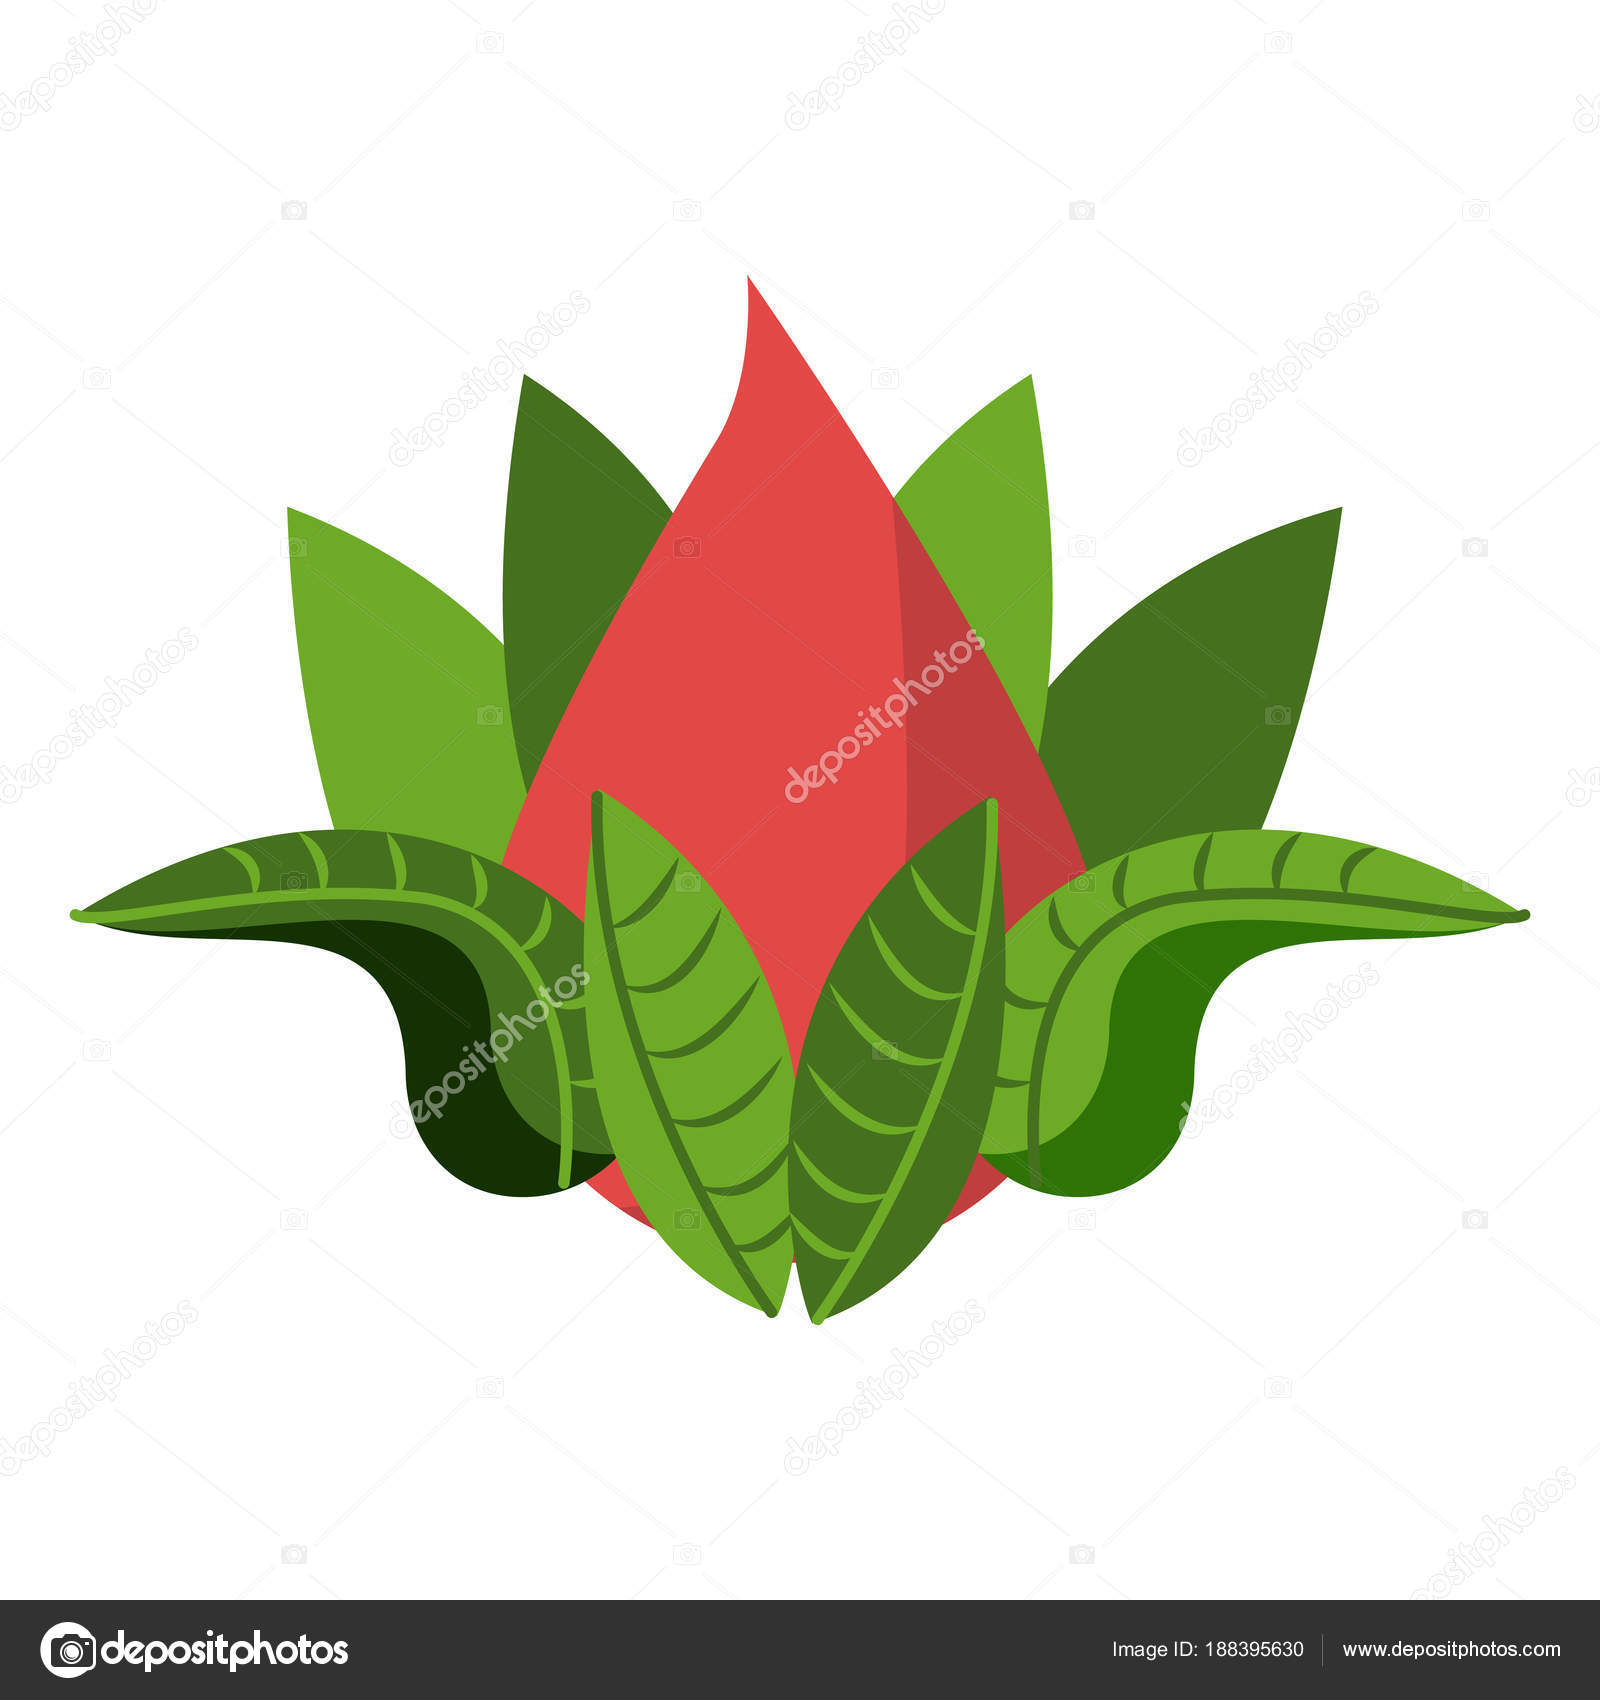 Lotus flower symbol stock vector jemastock 188395630 lotus flower symbol vector illustration graphic design vector by jemastock mightylinksfo